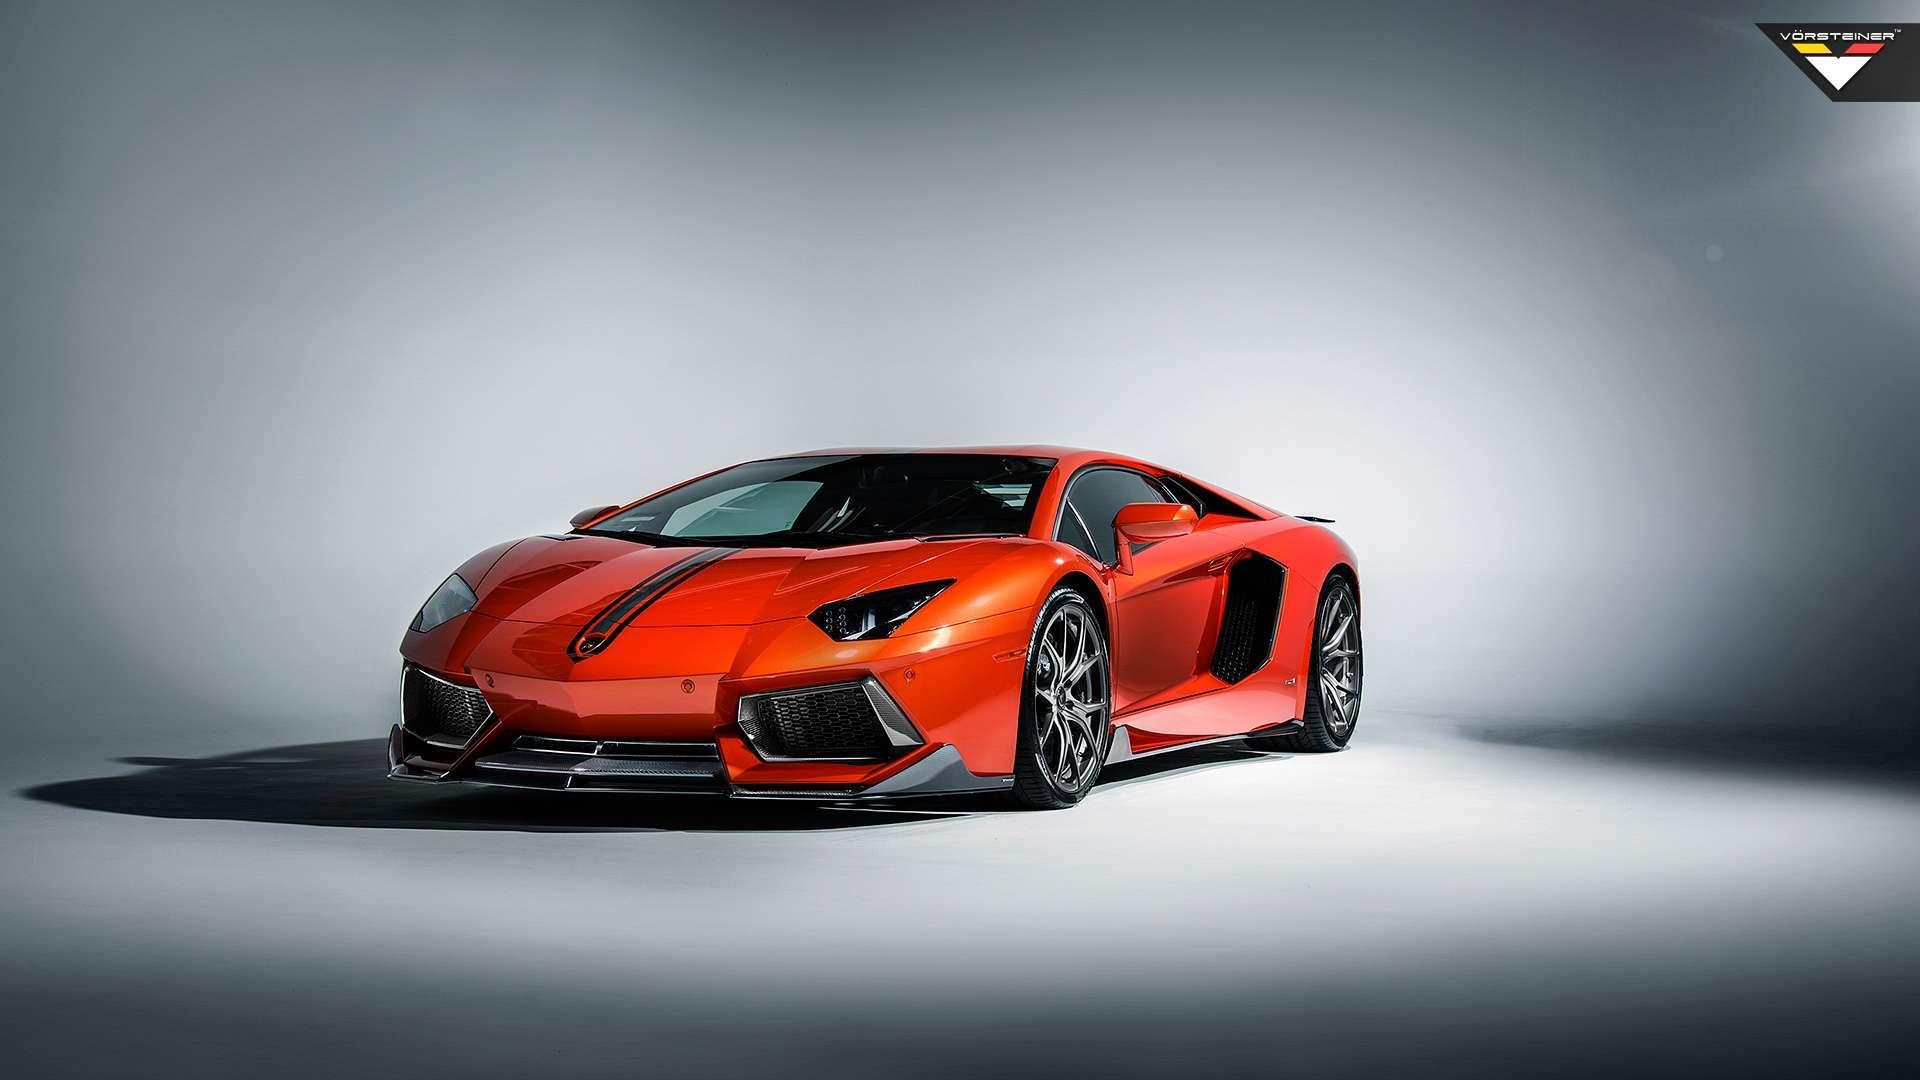 2015 hyundai sonata hd wallpaper 1080p hdwallwide - Lamborghini Huracan Hd Wallpapers 1080p